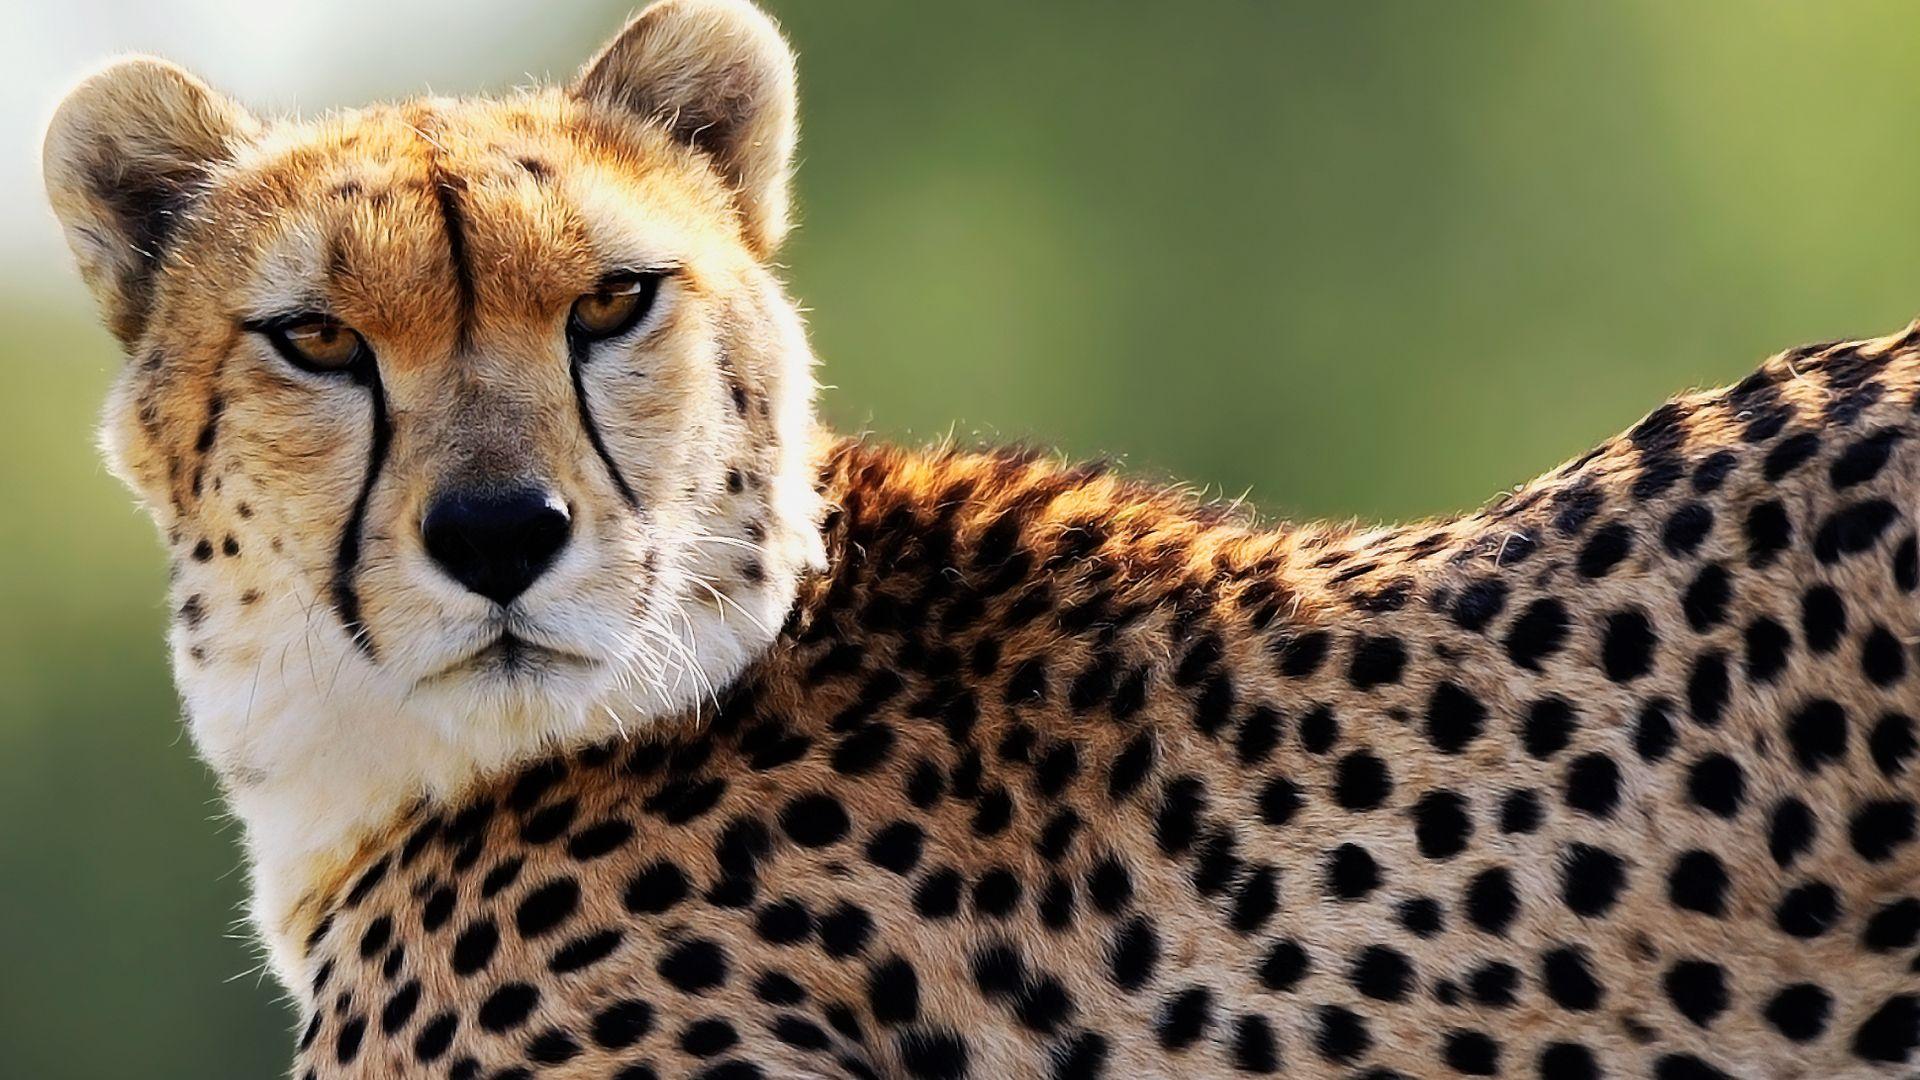 Jaguar face hd desktop wallpaper fullscreen wallpapers pinterest cheetah face hd wide wallpaper for widescreen wallpapers hd wallpapers voltagebd Image collections